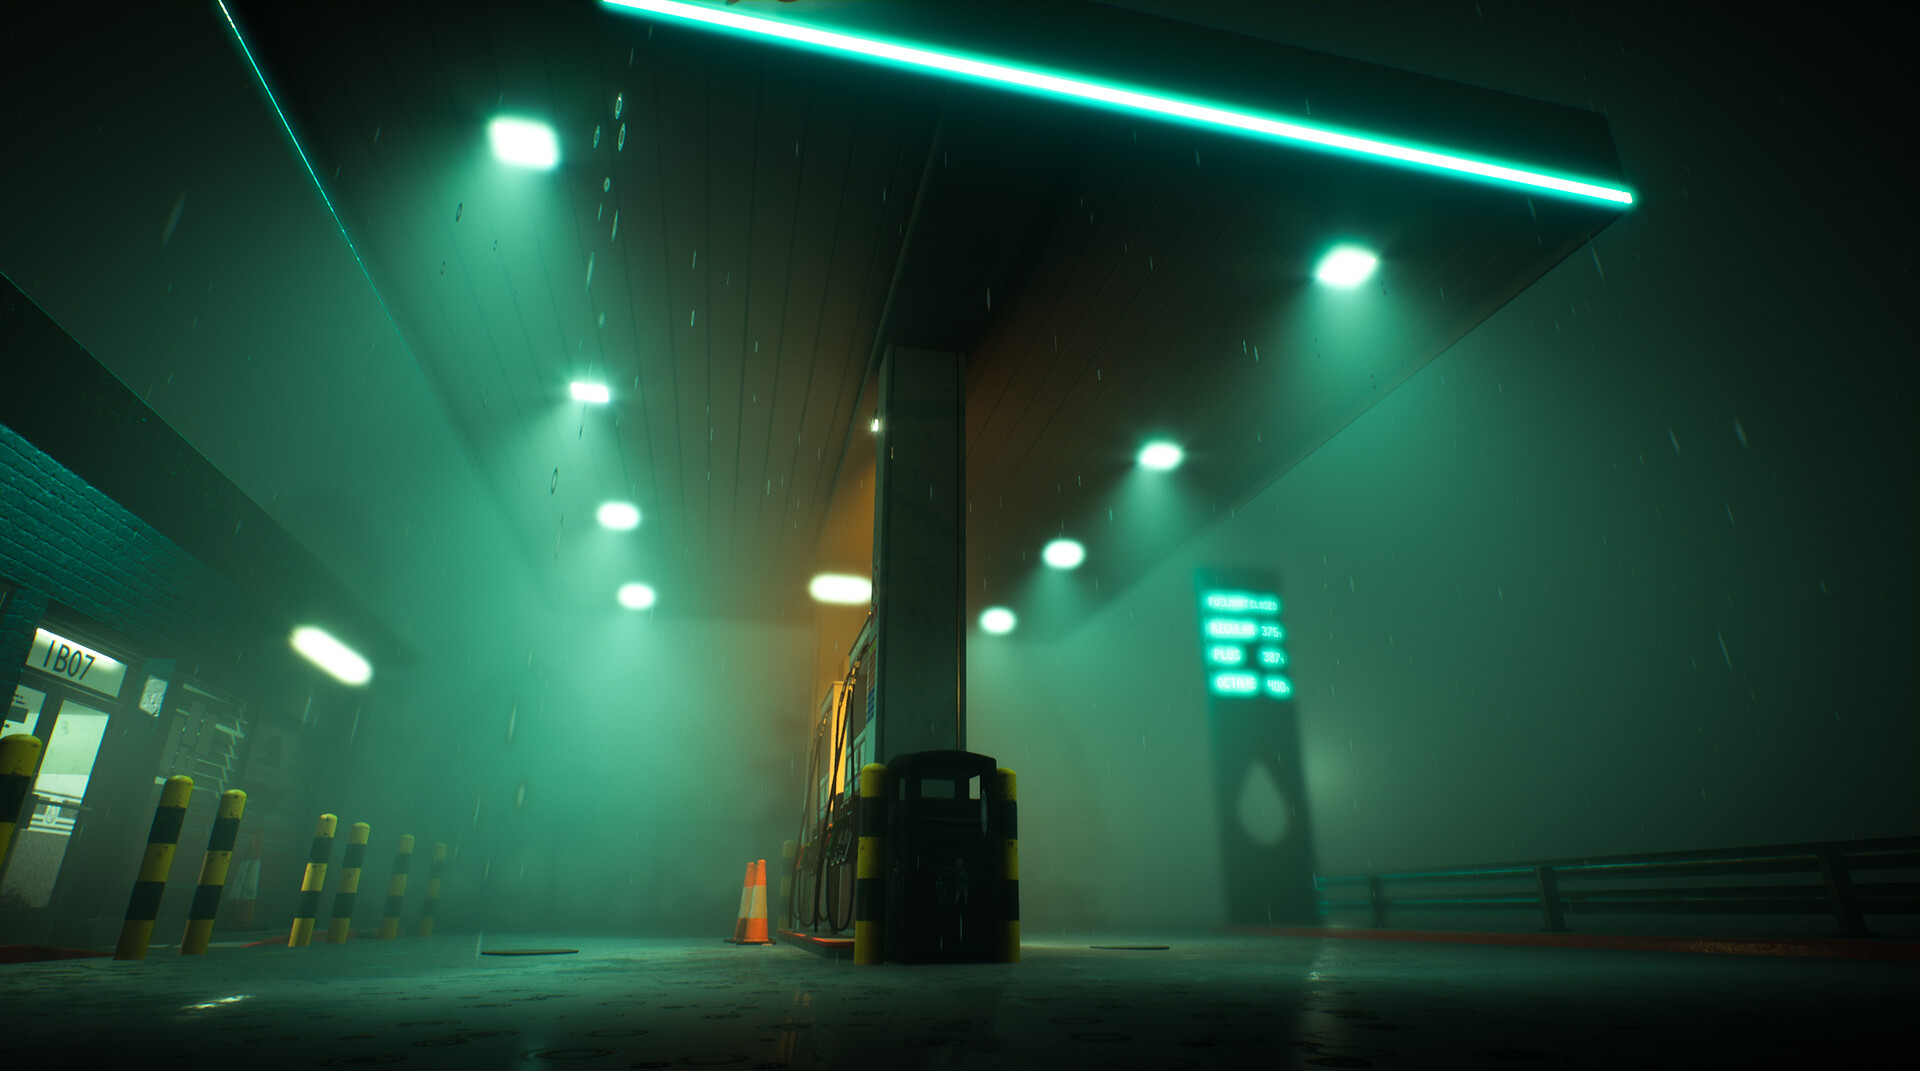 Carmen schneidereit gasstation green2